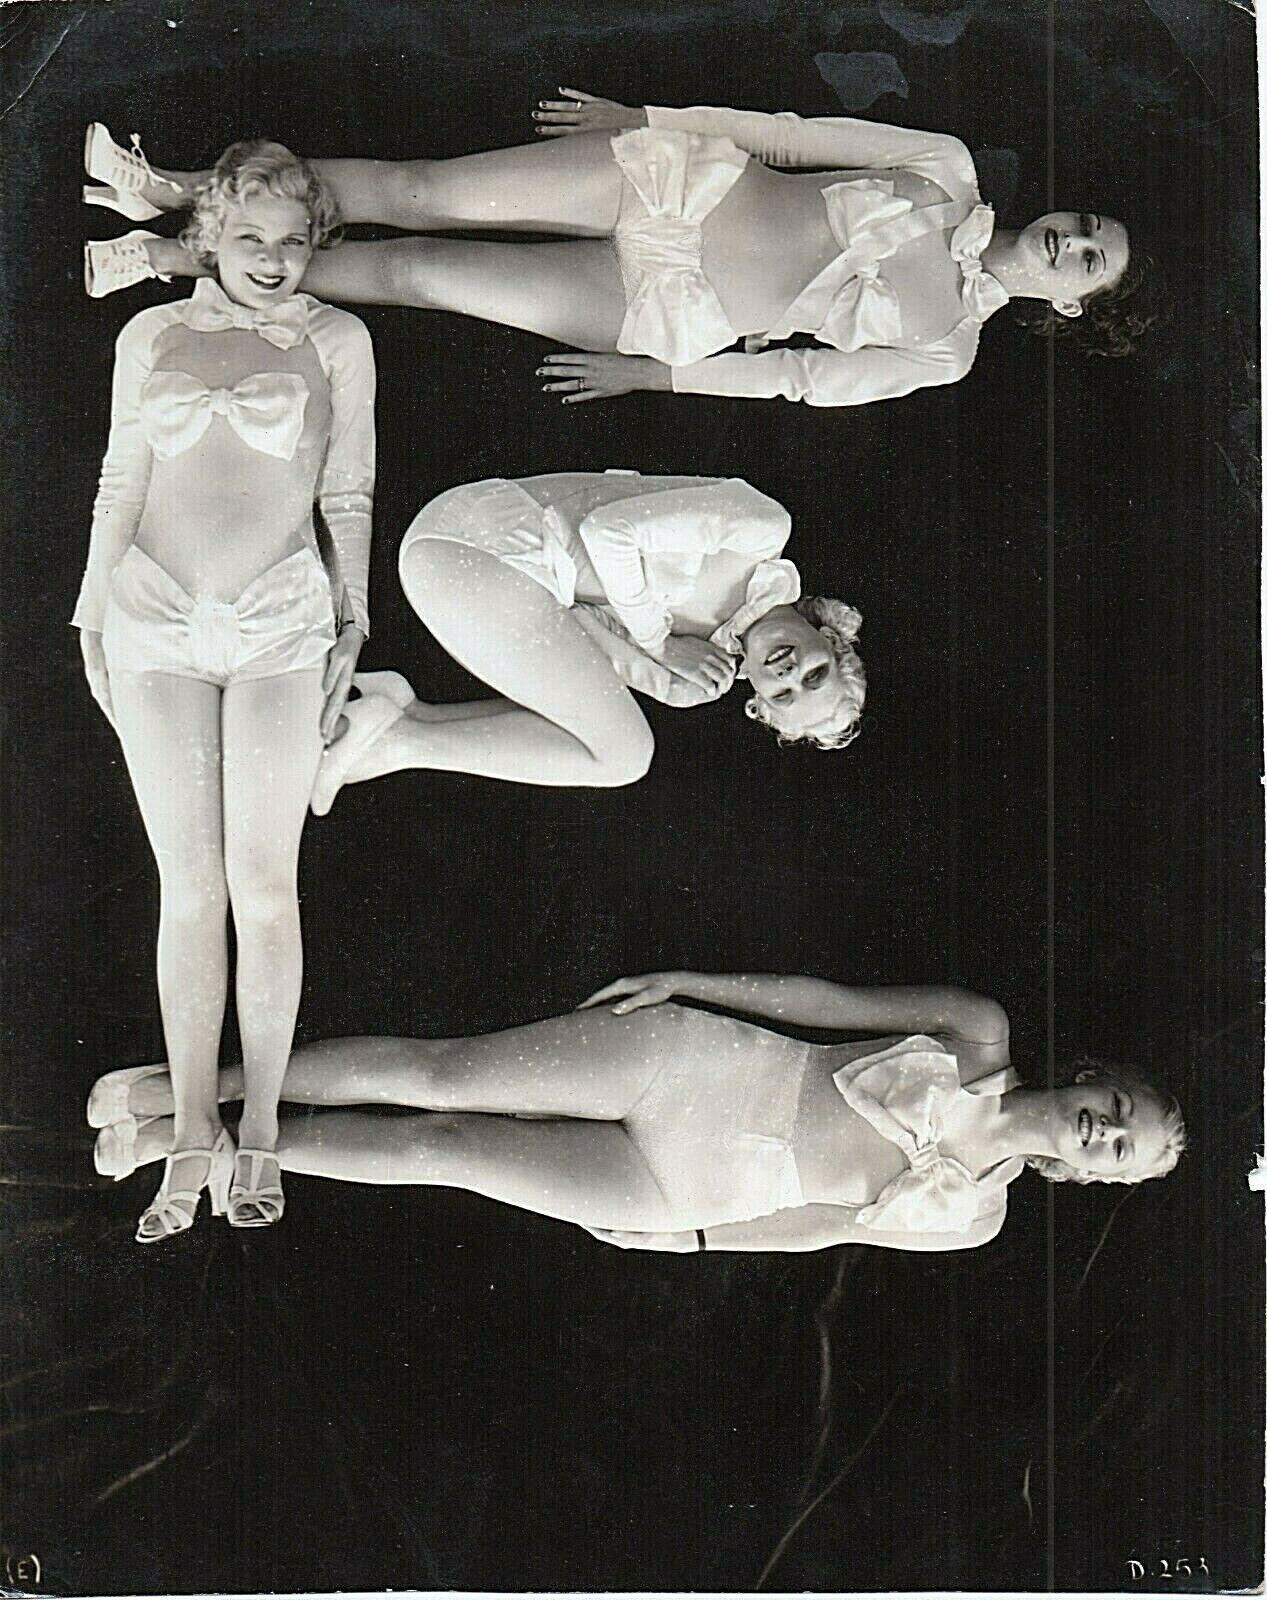 Diane Bourget, Beatrice Coleman, Patricia Harper, and Gladys Cummings in Dames (1934)